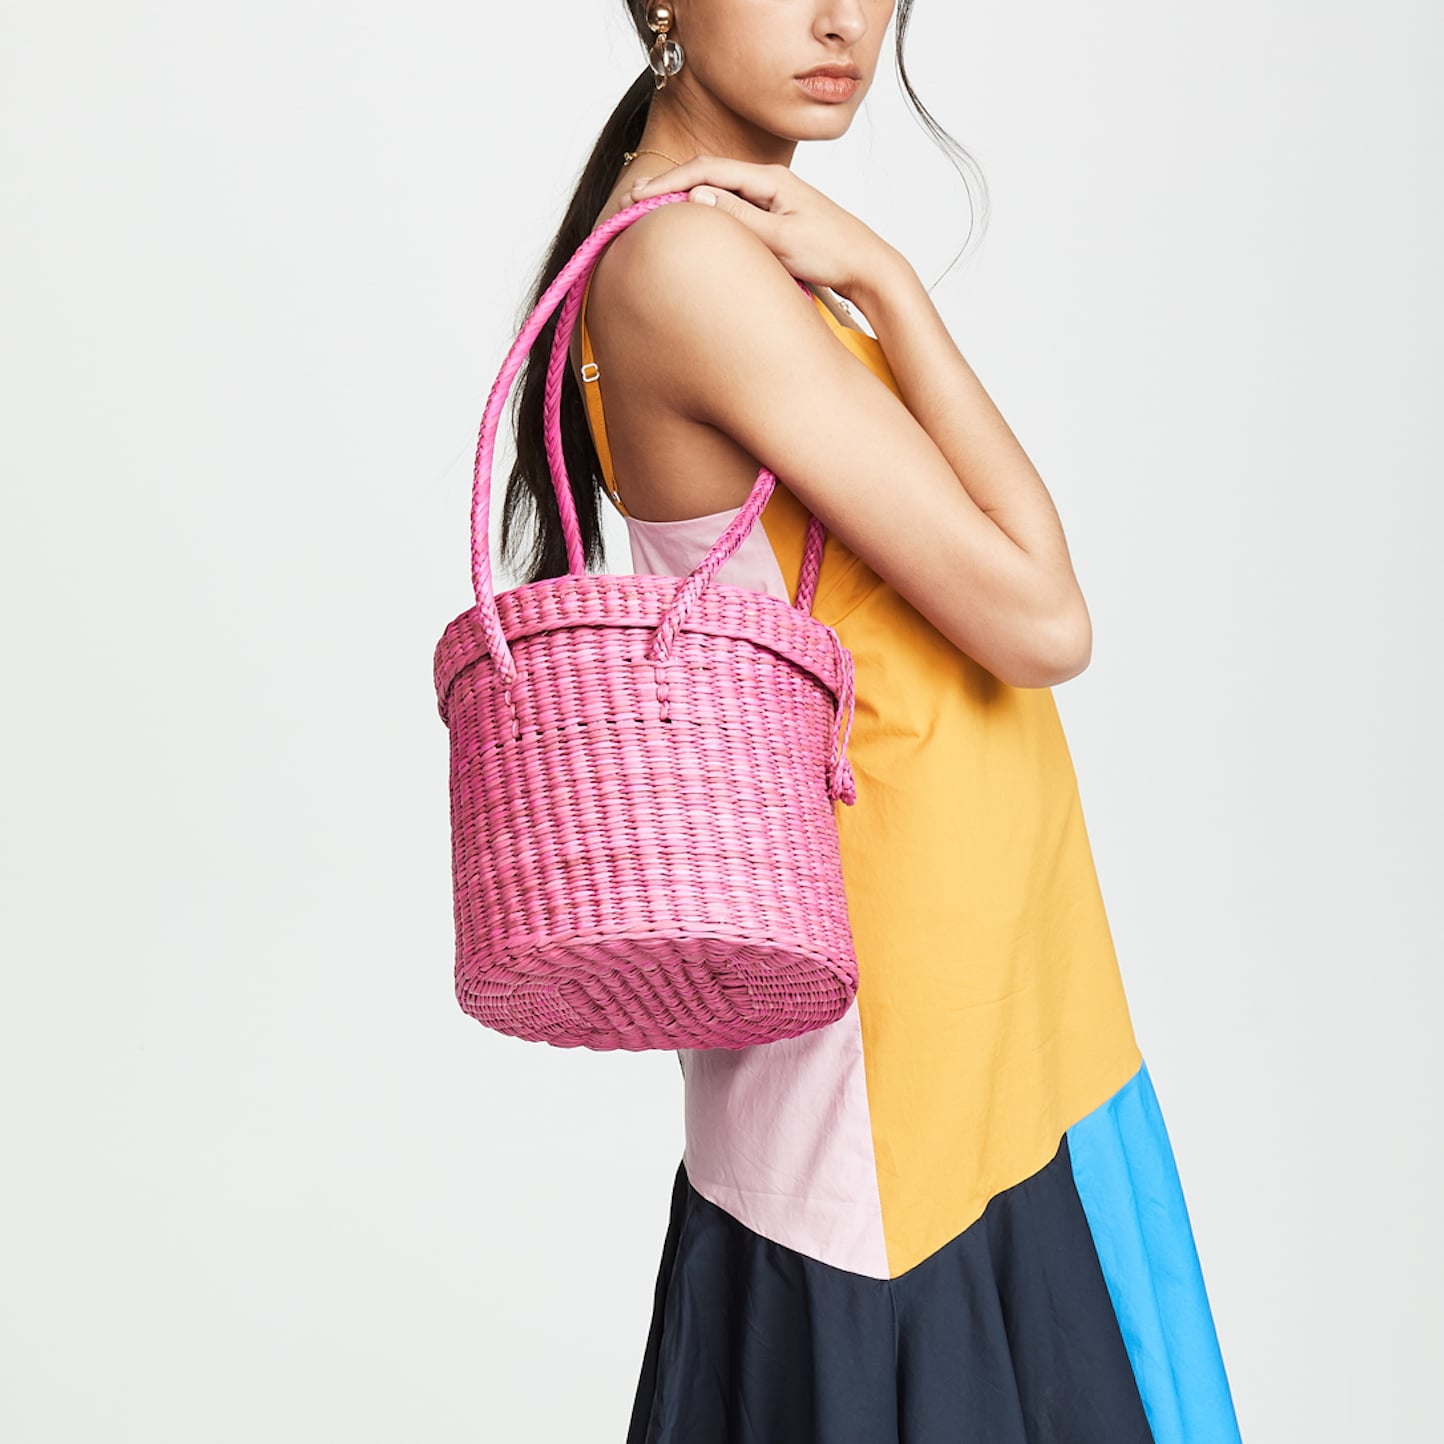 d62bd9aa31a reTH Women's London Bag   Best Cheap Fashion Accessories For Summer on  Amazon   POPSUGAR Fashion Photo 27